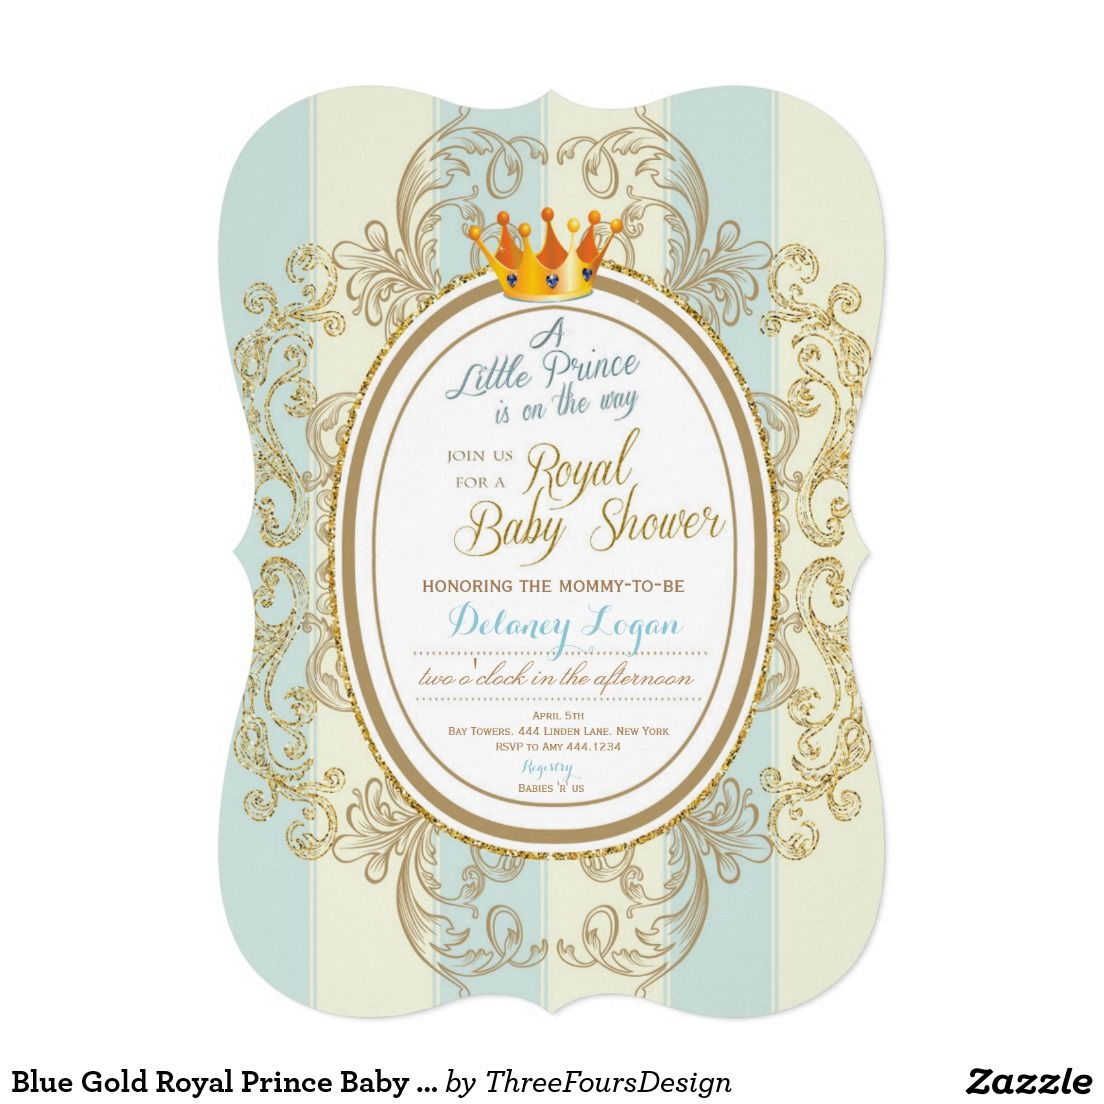 Blue Gold Royal Prince Baby Shower Invitations | Royal prince ...